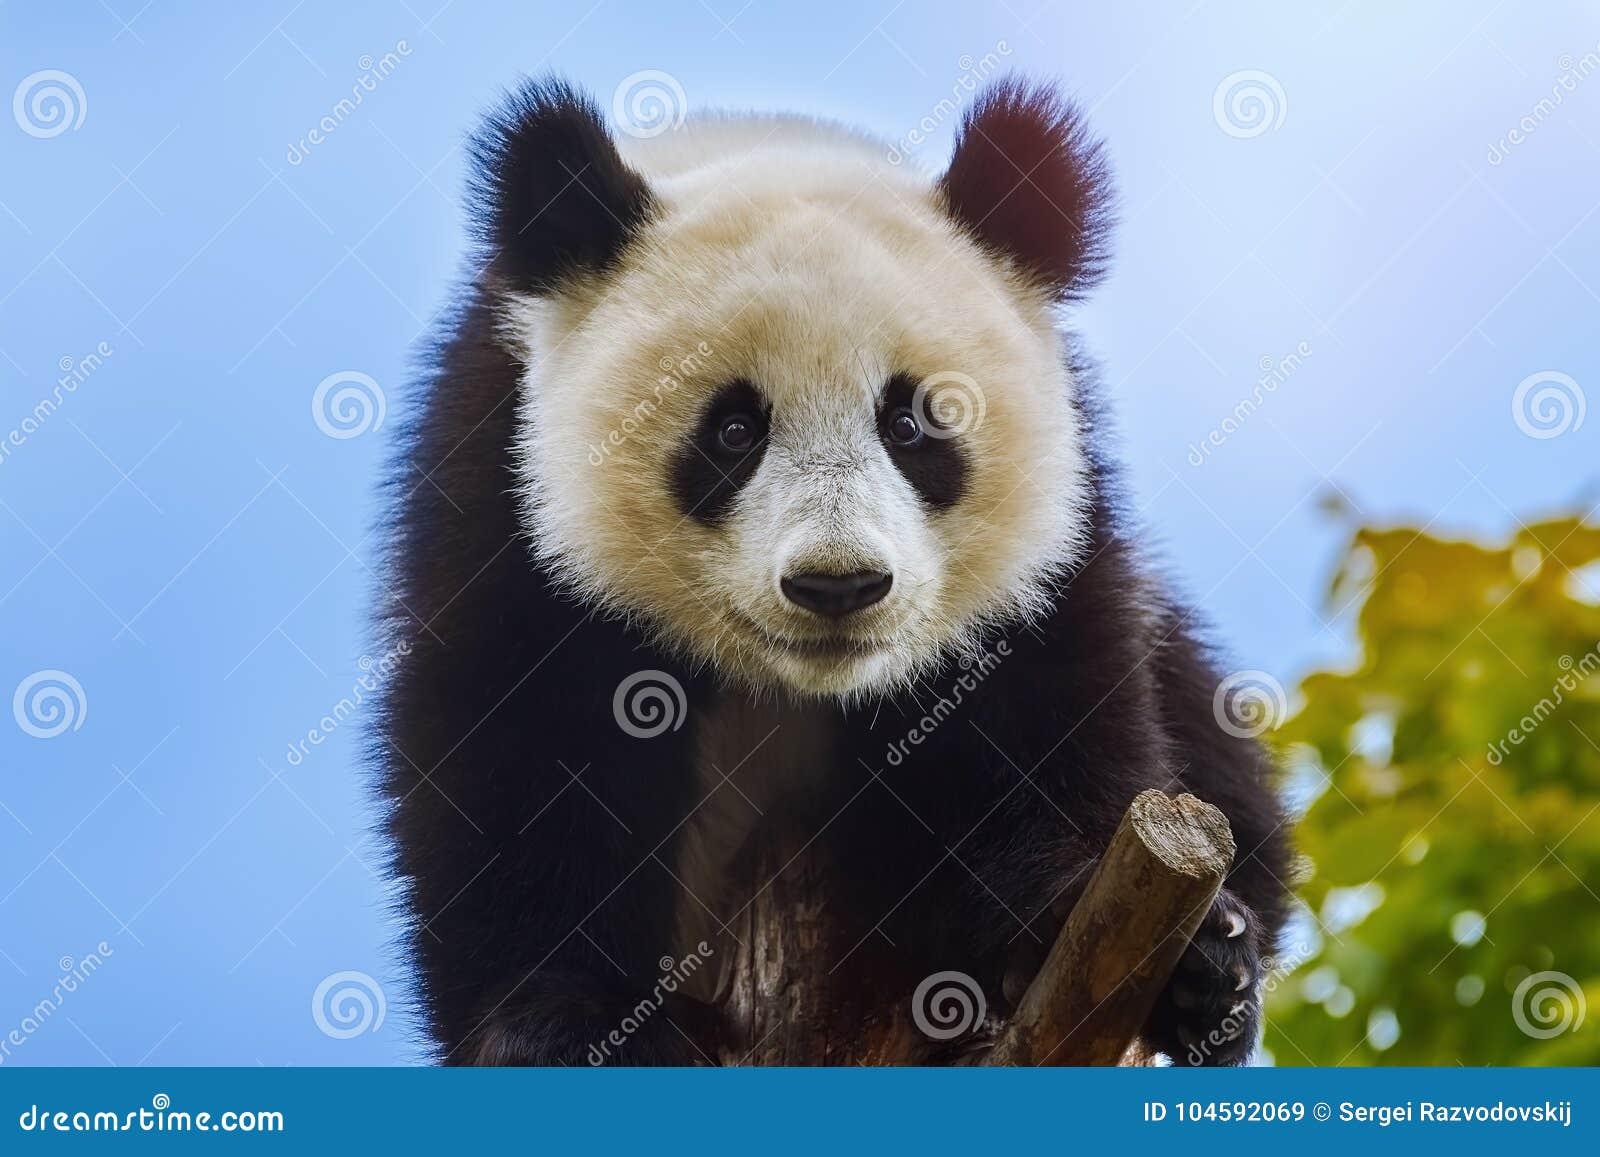 Giant Panda at the Tree